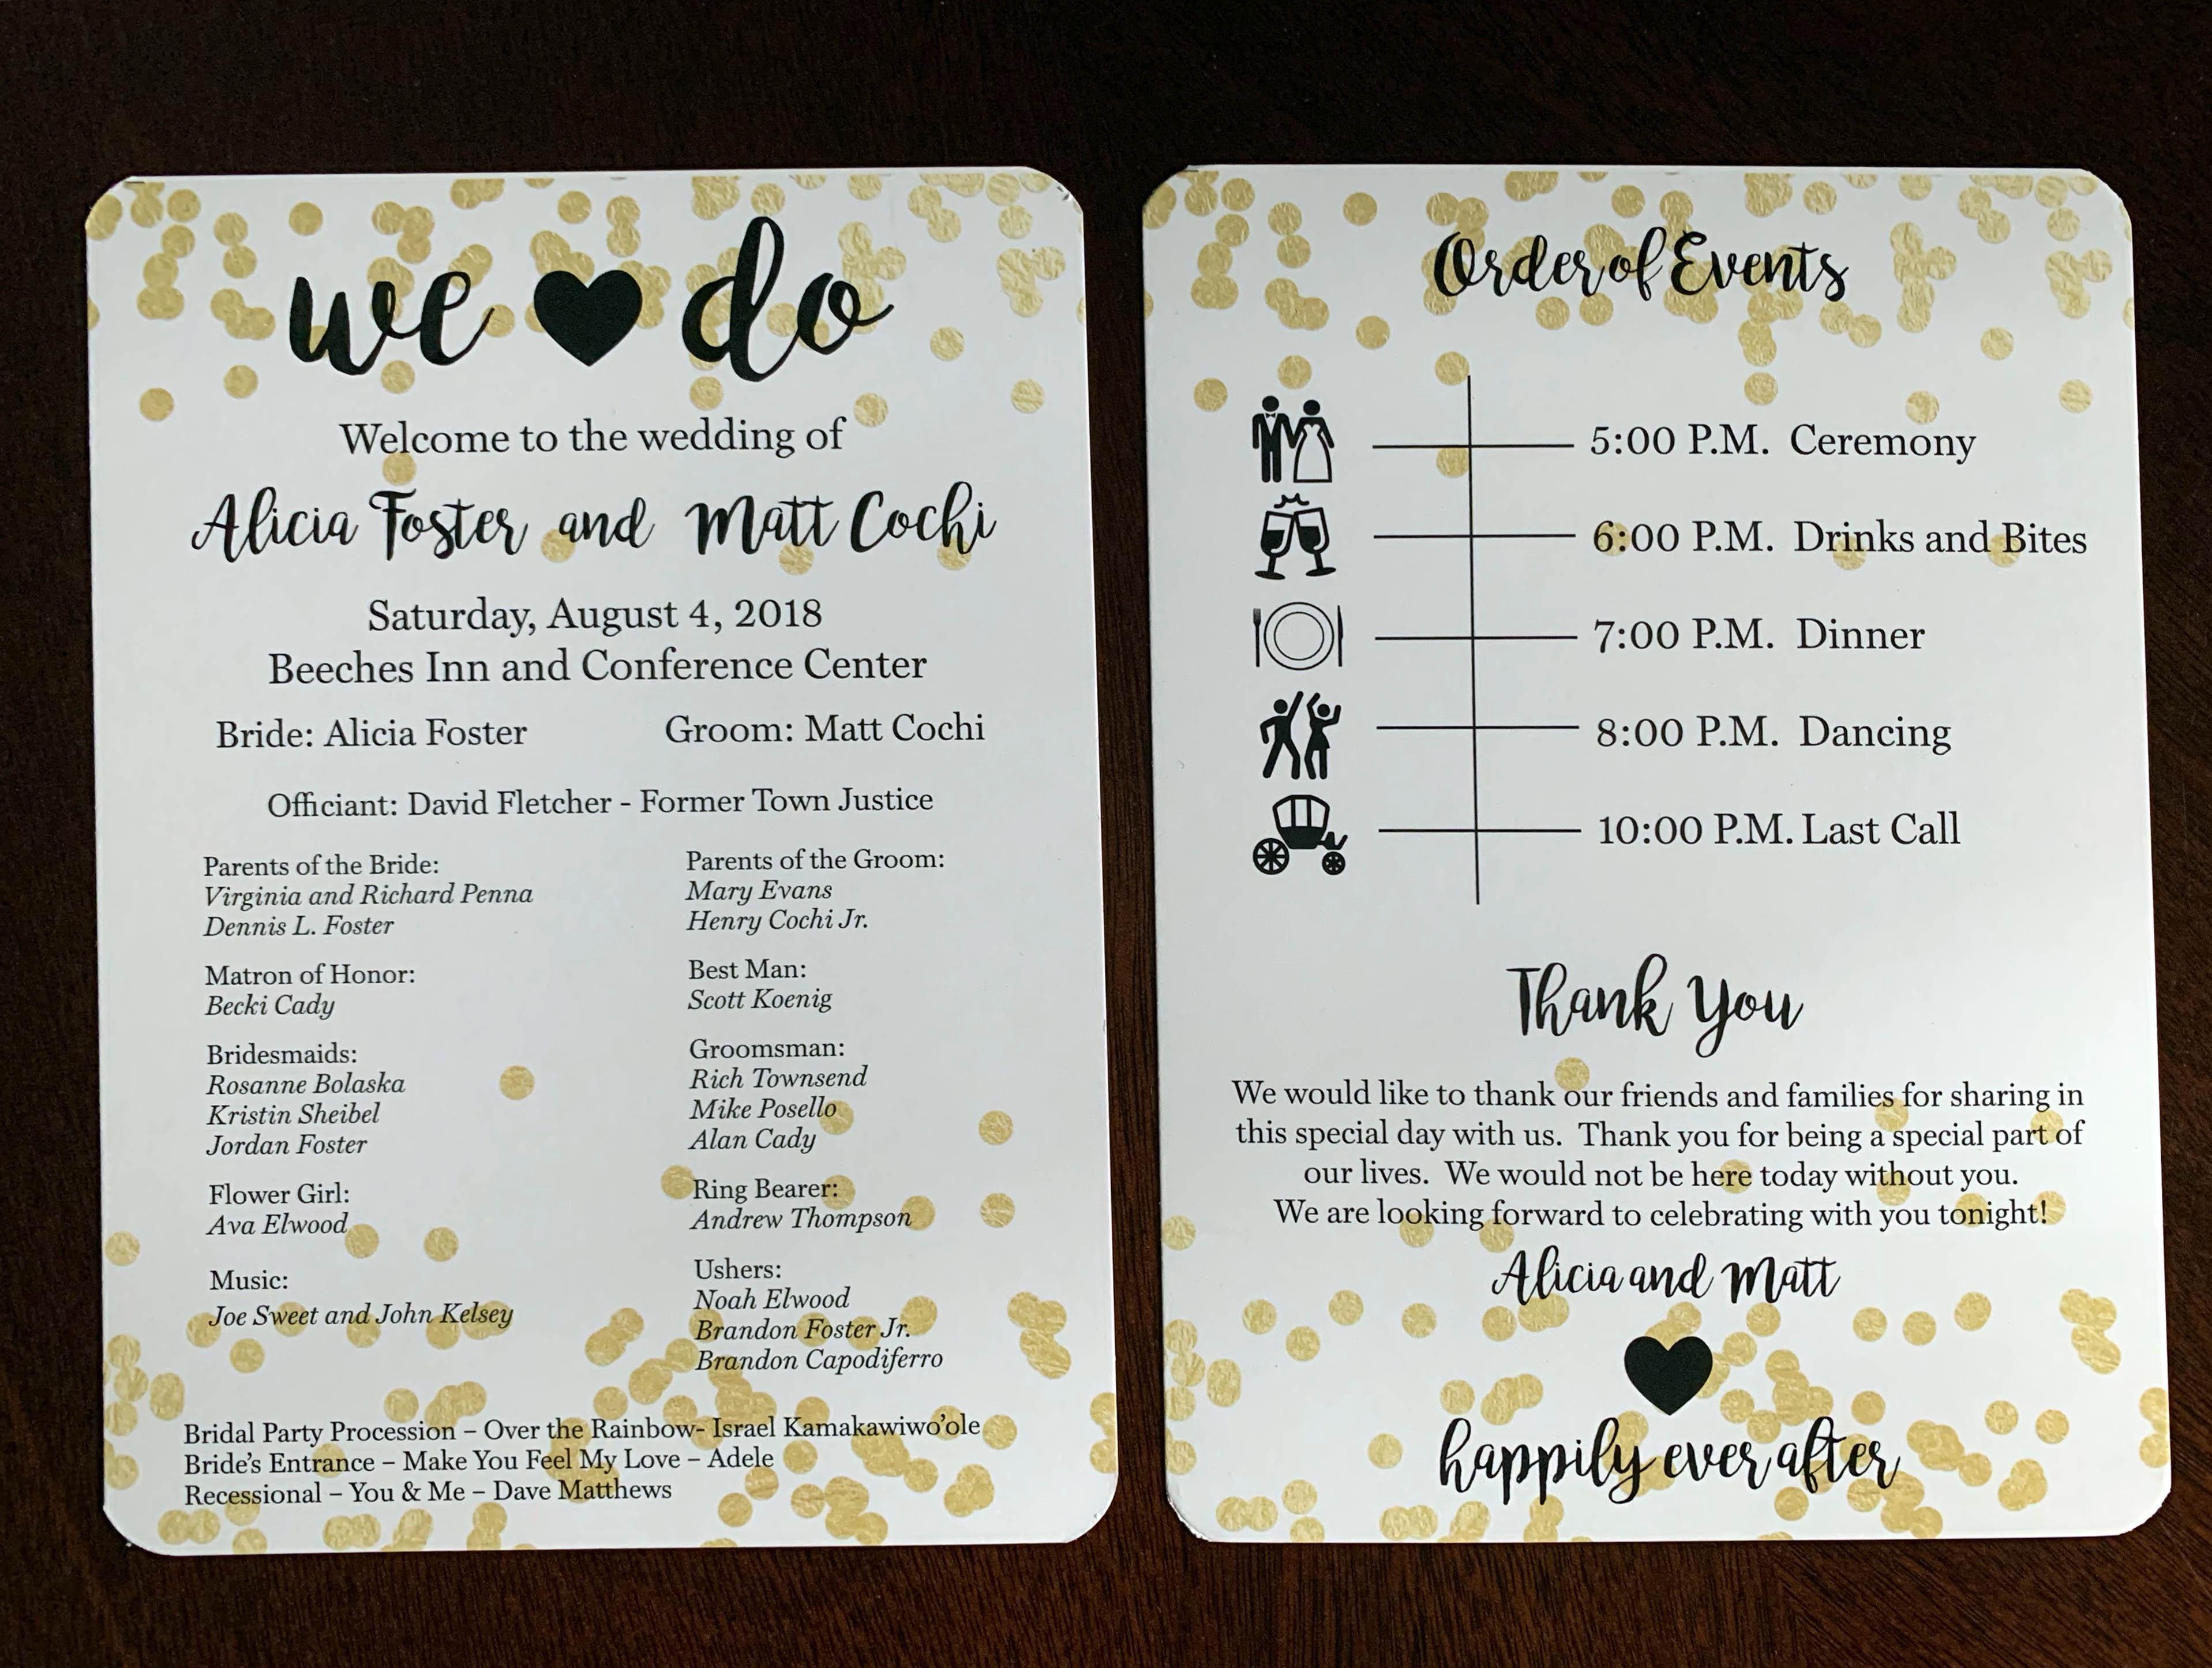 Two Sided Ceremony Program